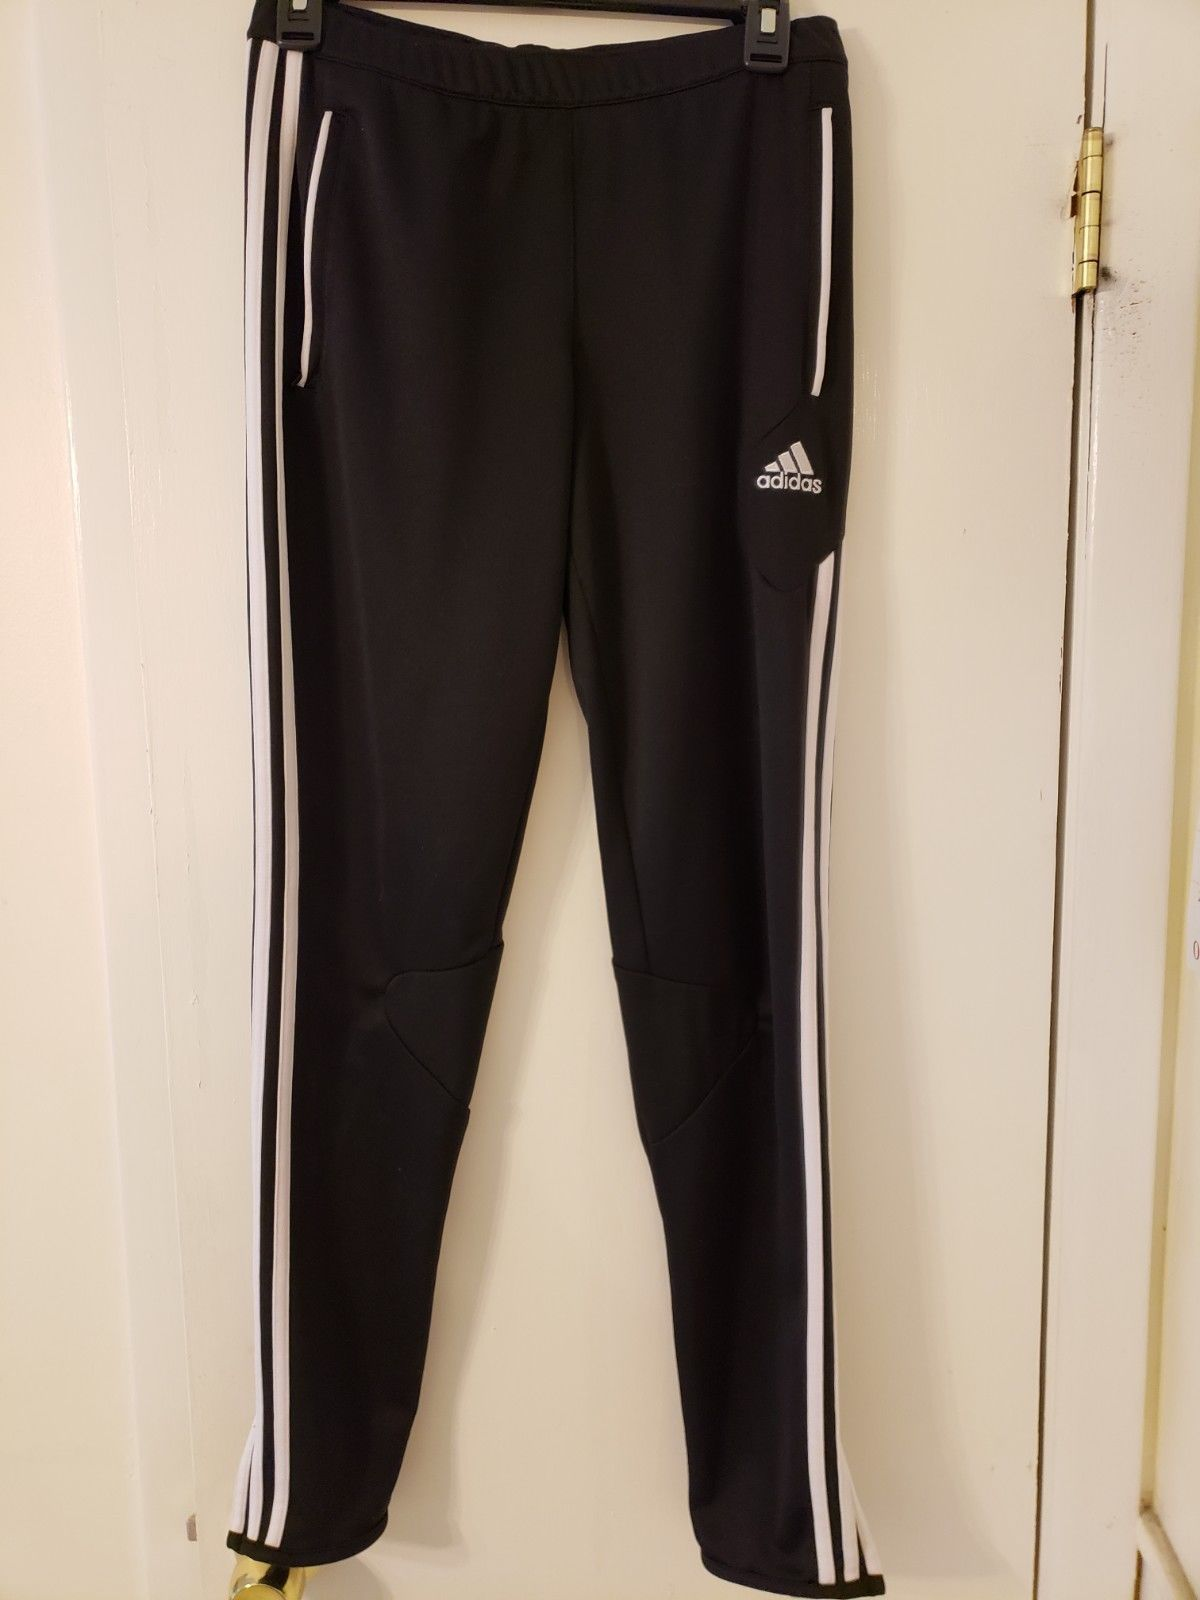 ADIDAS ClimaCool Pants Womens S Slim Black  6624800988